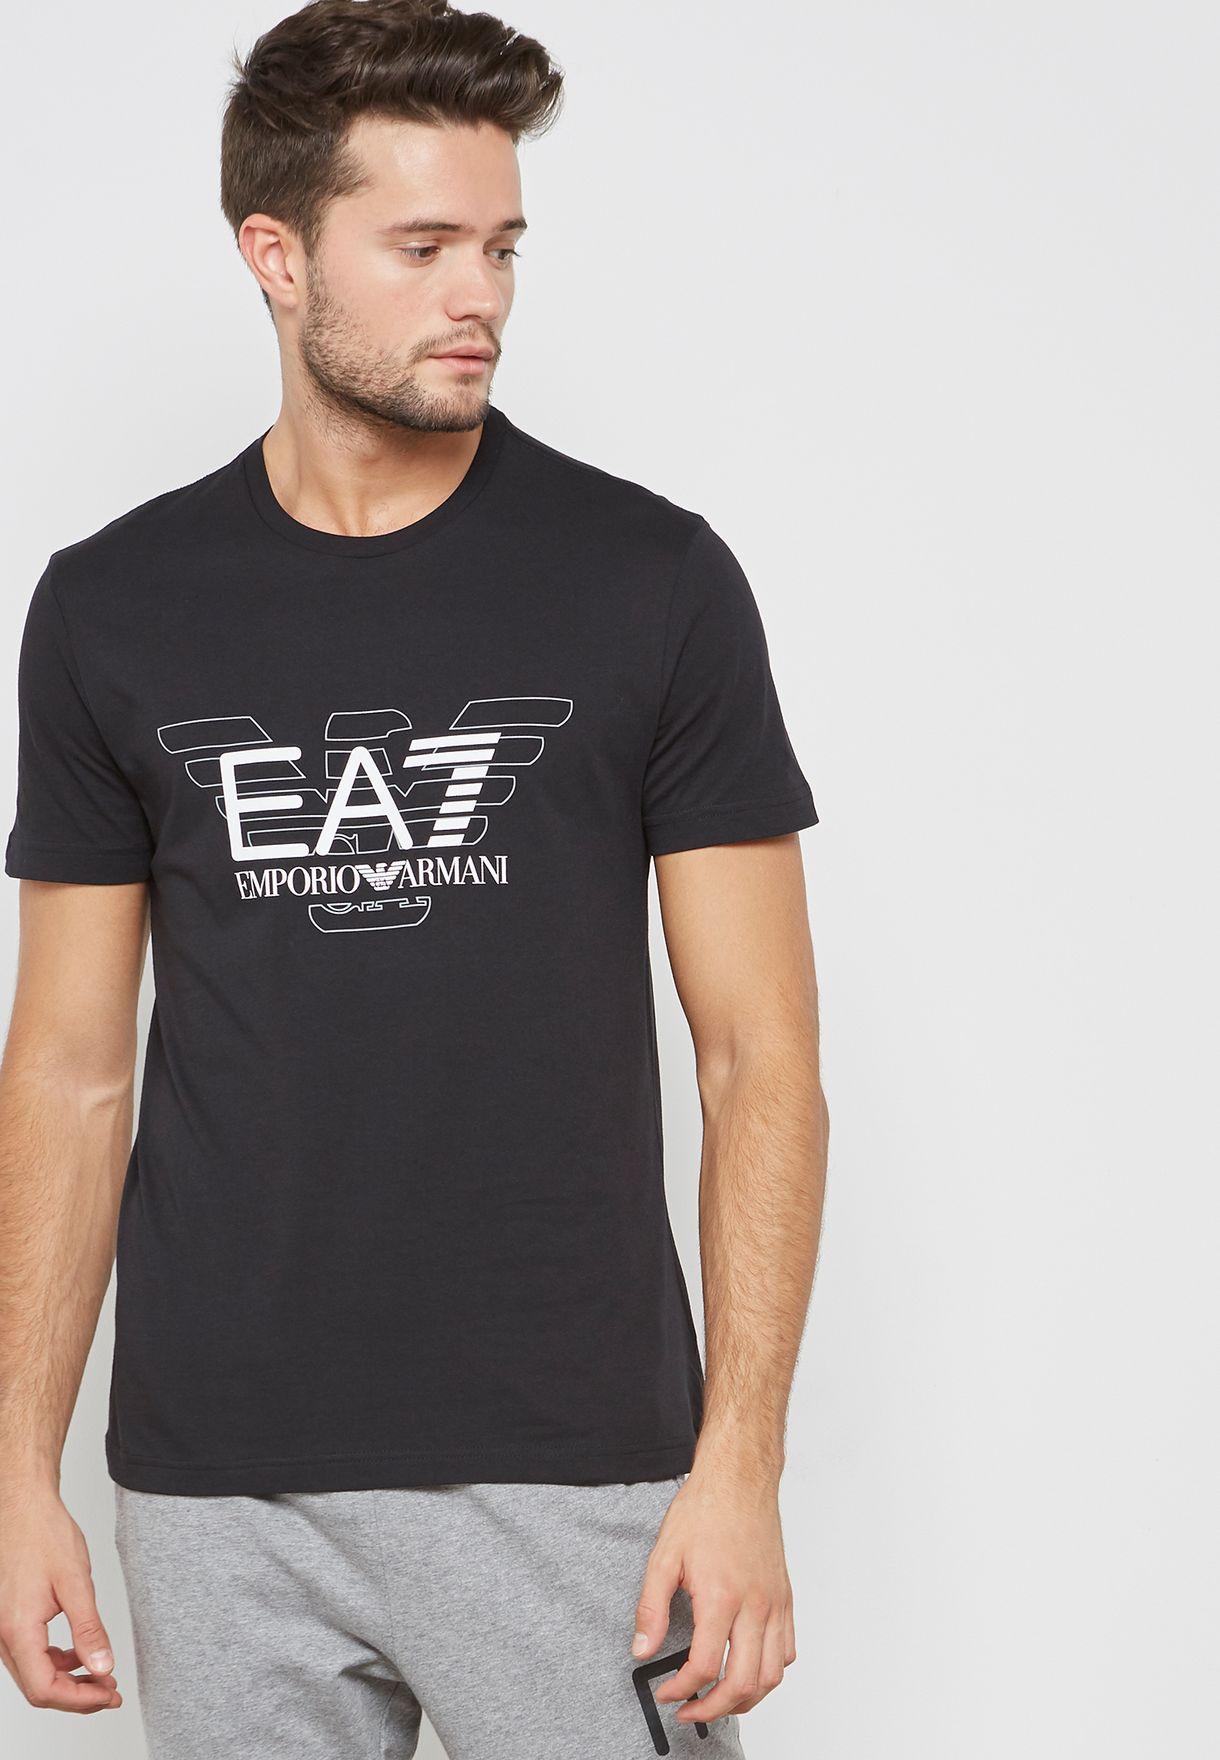 b2dcab12 Shop Ea7 Emporio Armani black Train Graphic Series T-Shirt PJ30Z ...